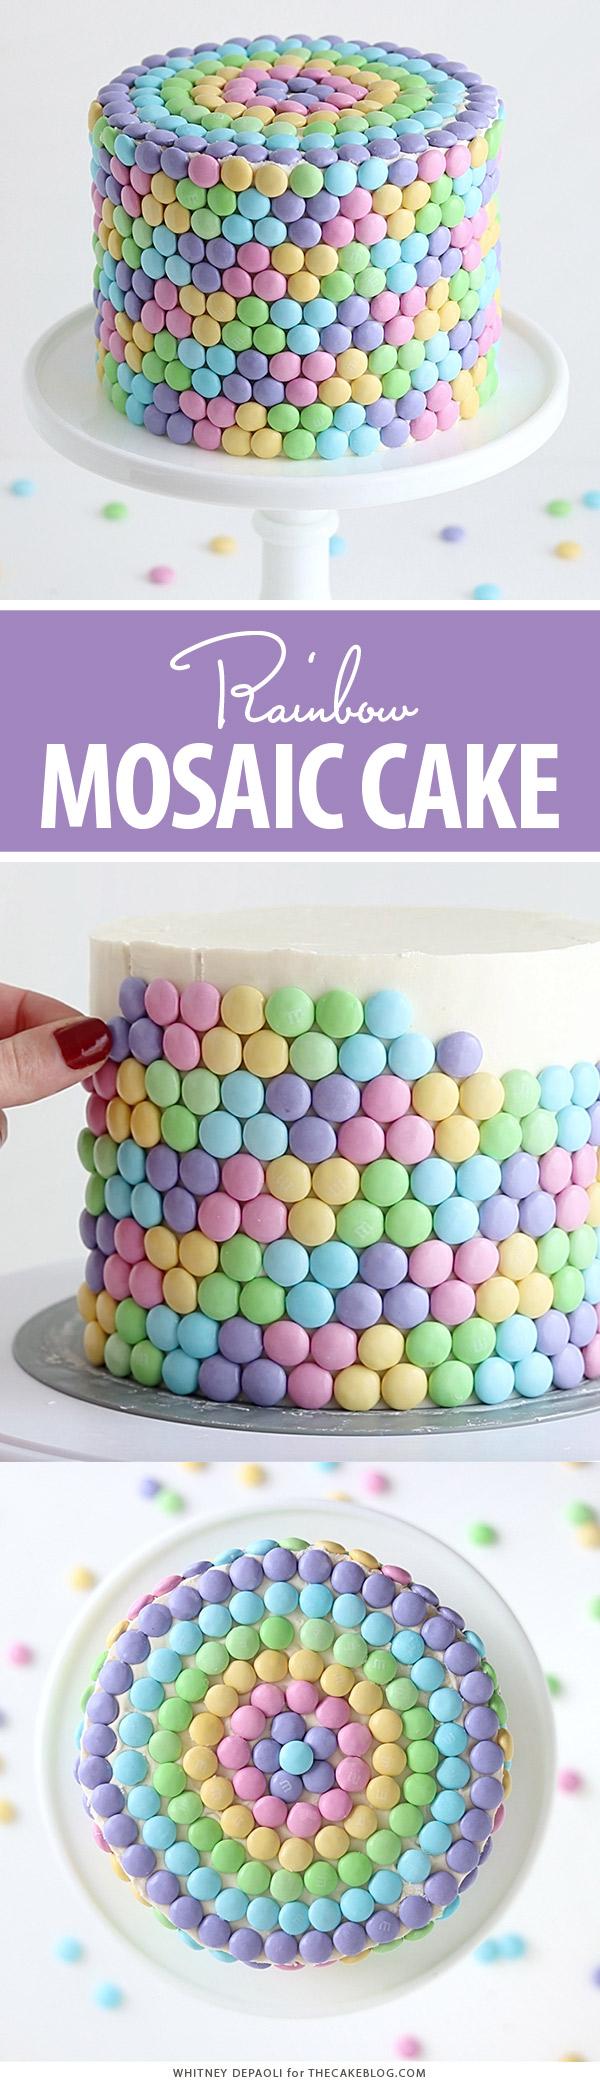 Pastel Rainbow M&M Cake   by Whitney DePaoli for TheCakeBlog.com